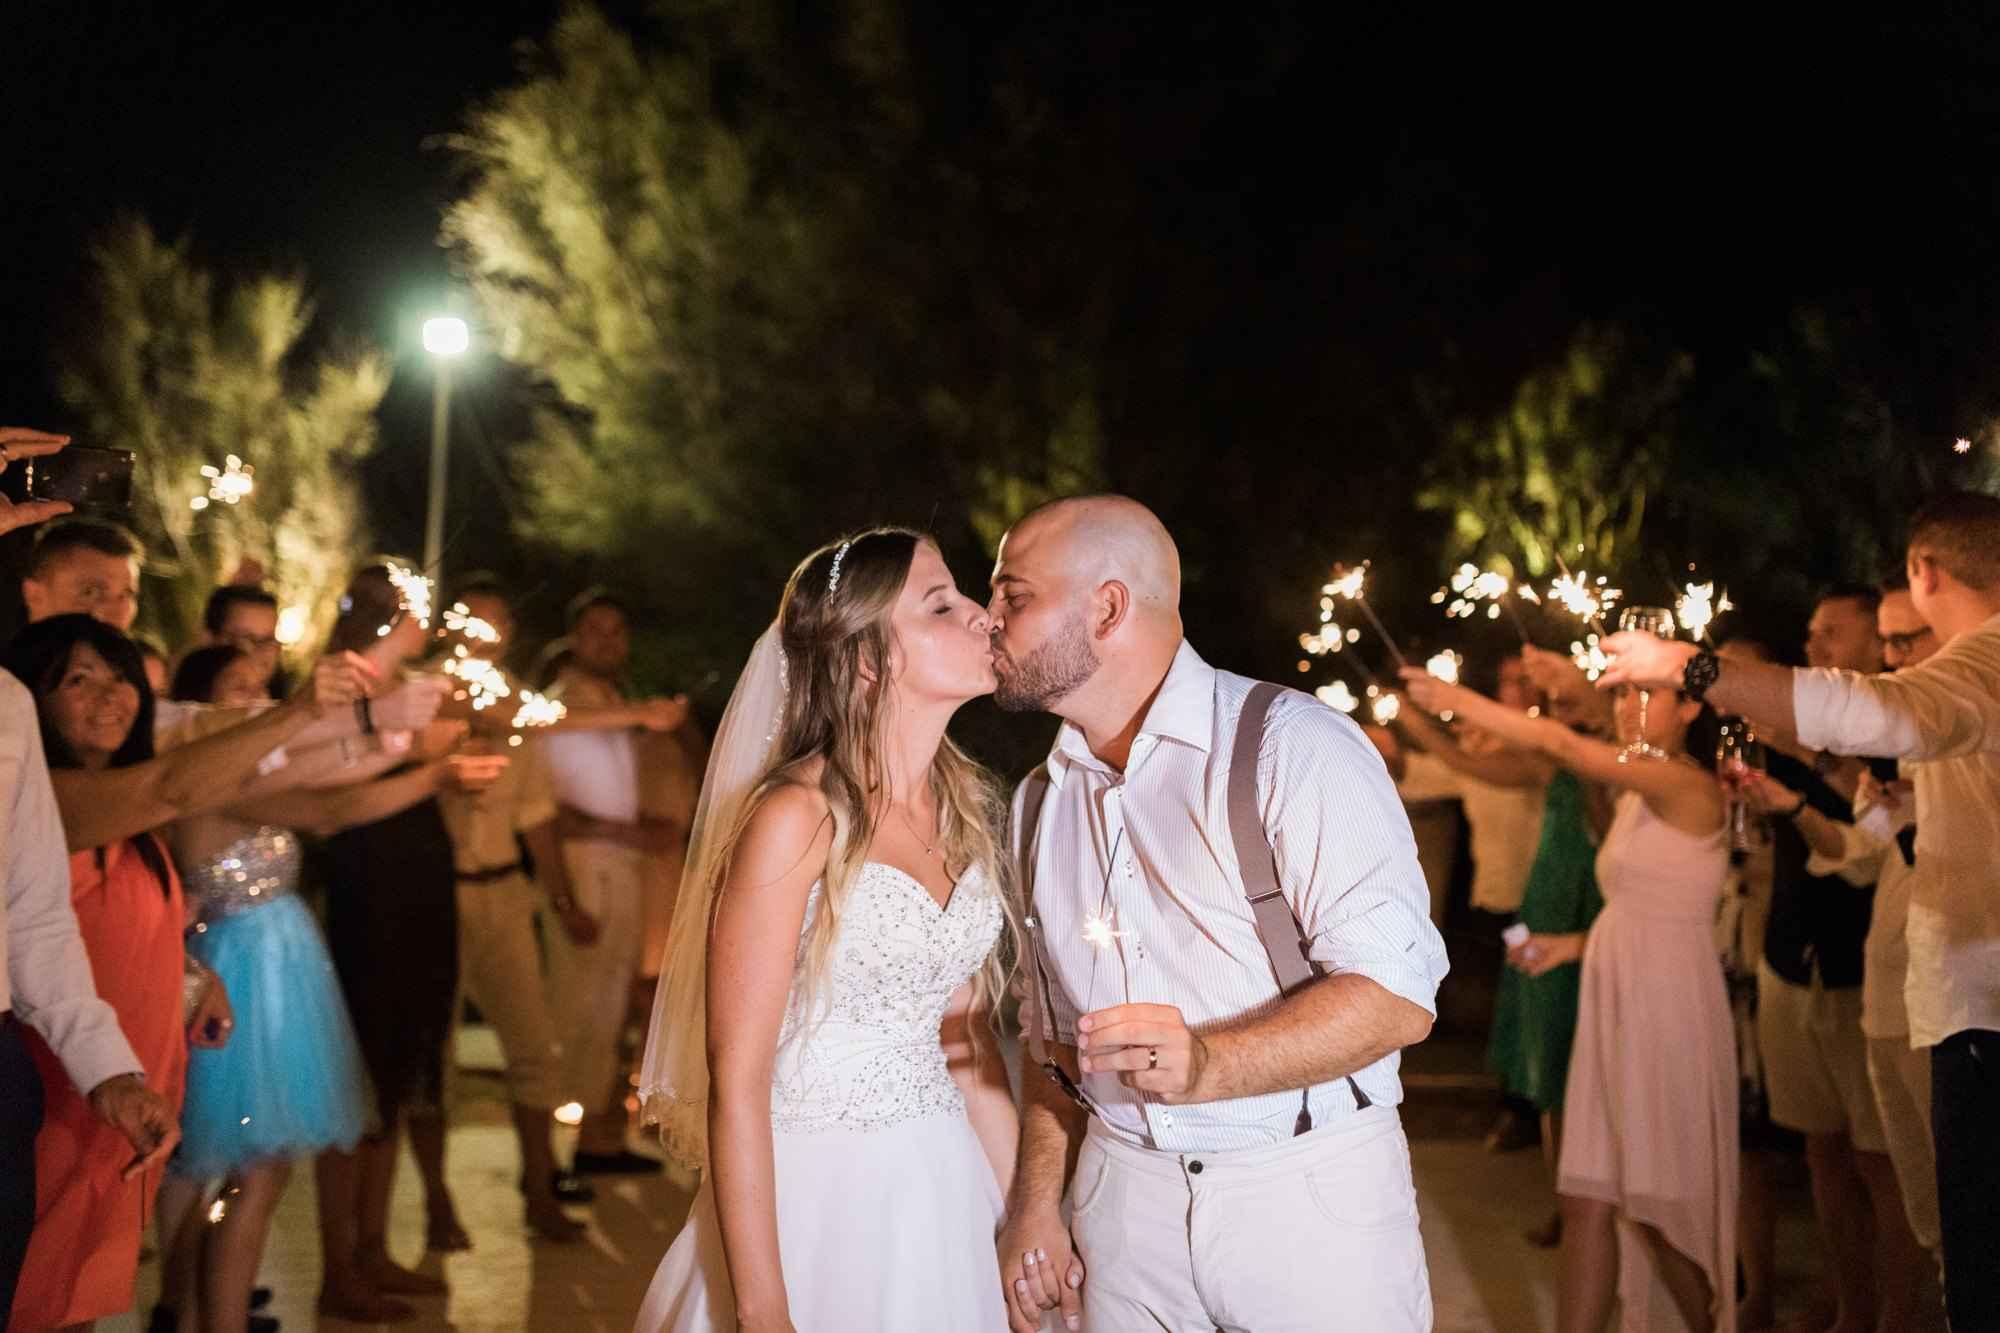 Couple Enjoys Romantic Sunset Wedding by the Sea in Monopoli